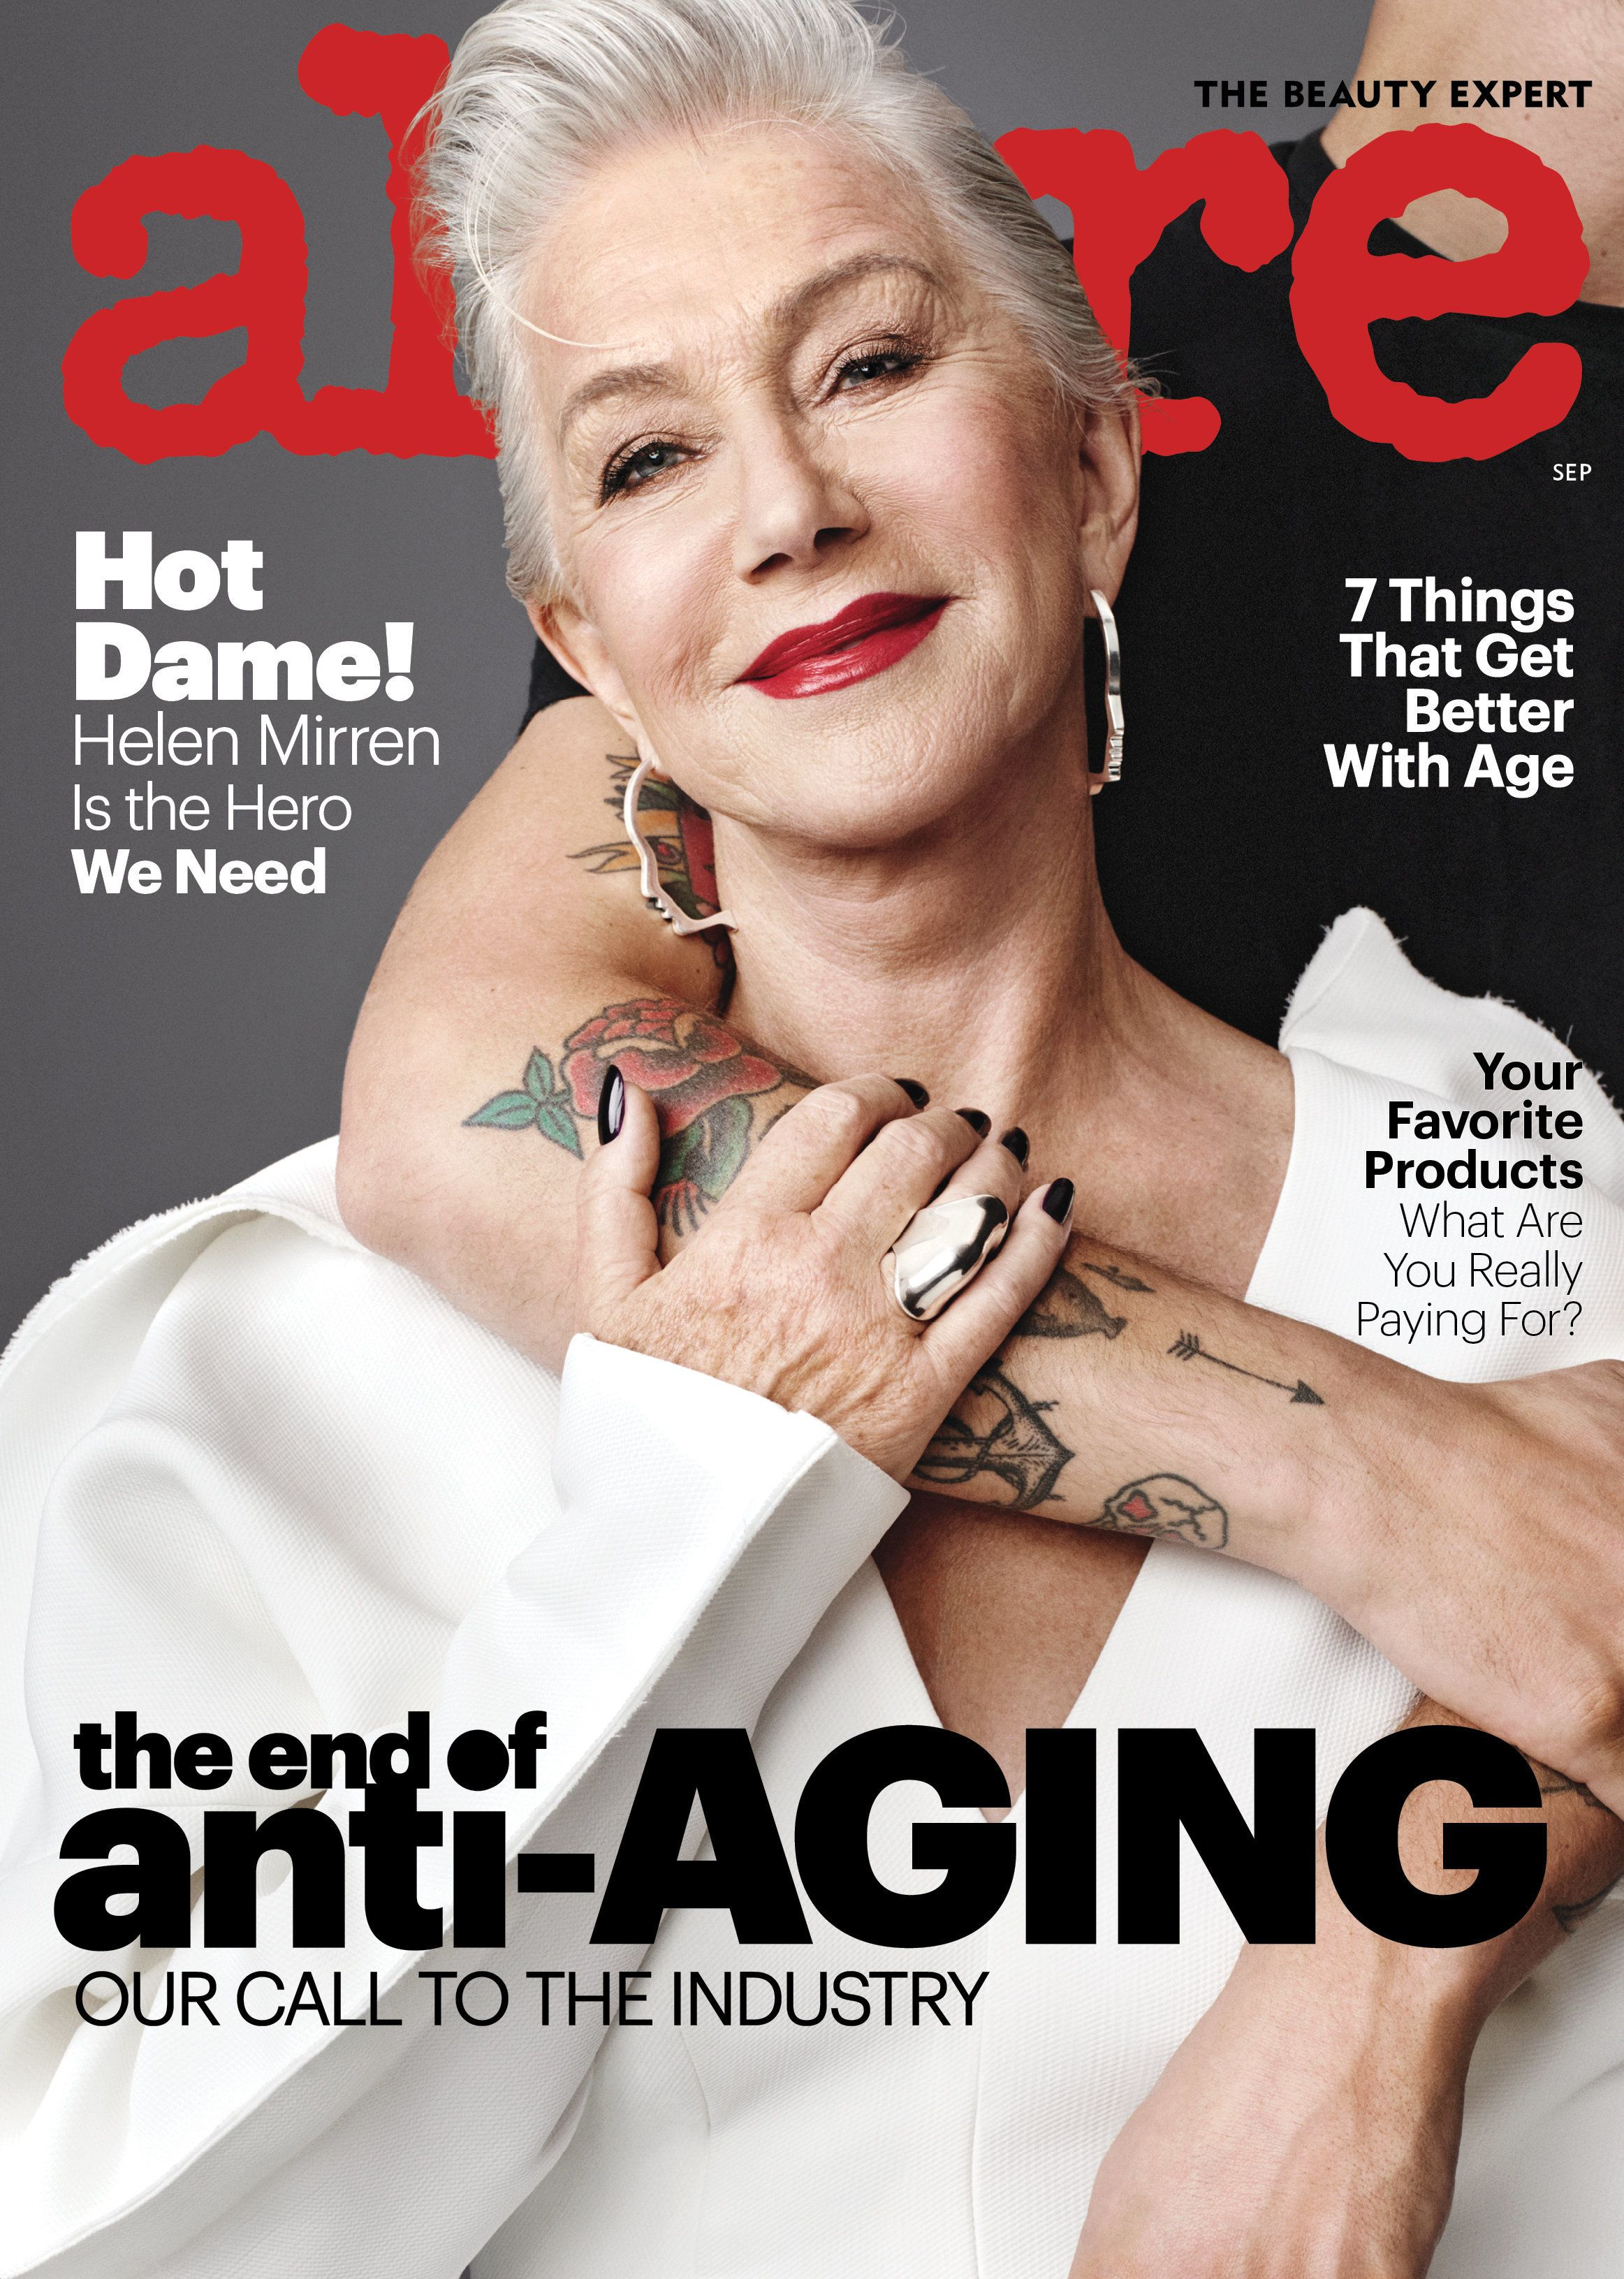 See you later, harmful aging rhetoric.